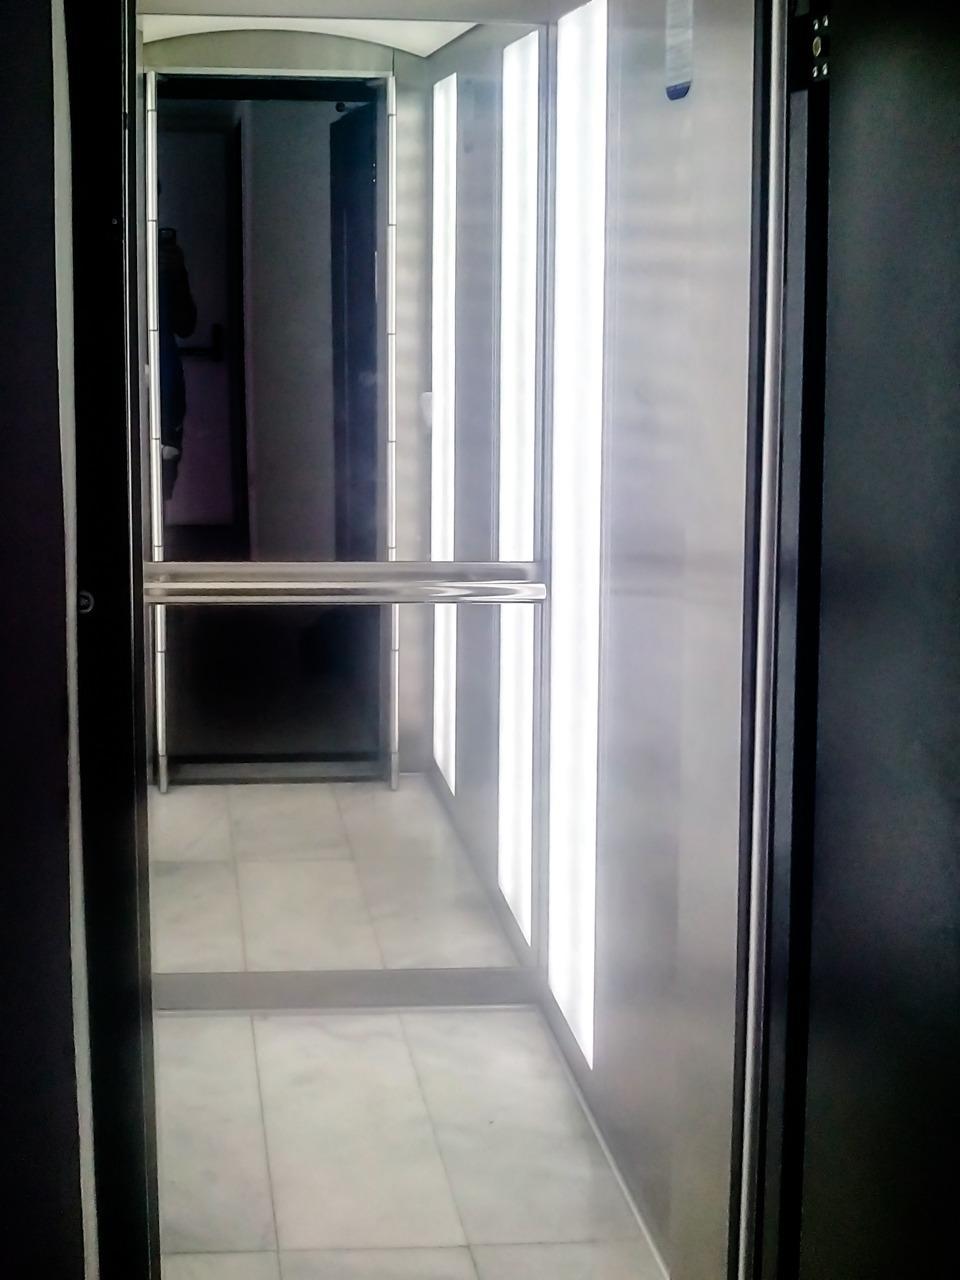 zlift-erga-lifts-28 Εγκατάσταση Ανελκυστήρα - Ρόδος